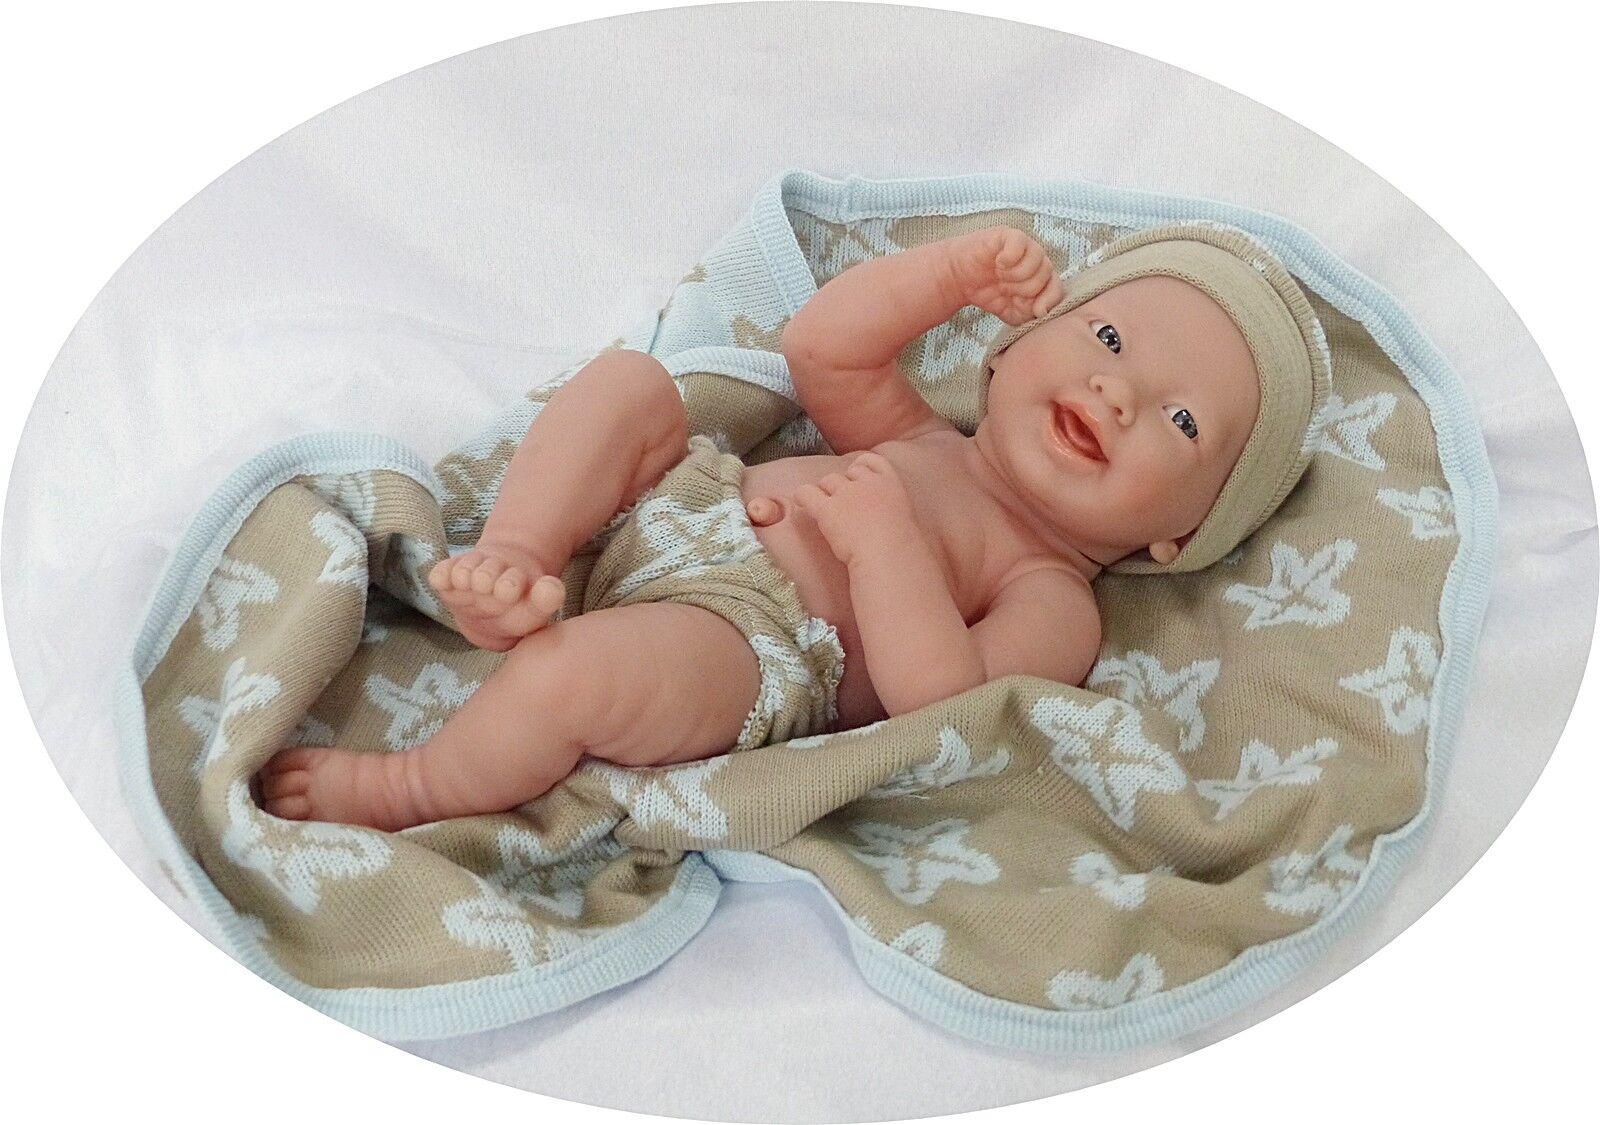 Berenguer lebensechte Babypuppe 36cm Vinylfullbody anatomisch korrekter Junge